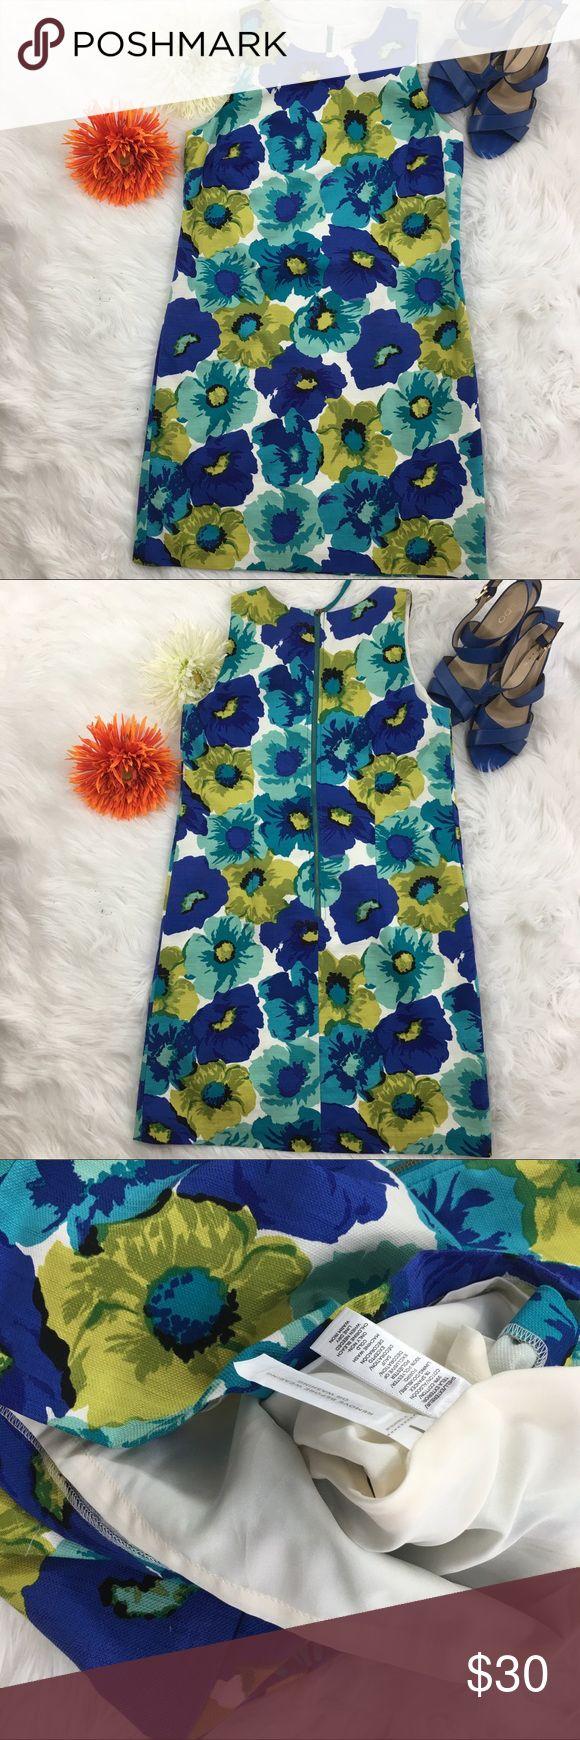 Loft Floral Dress Beautiful floral dress from Loft. It is a petite size; however, it can easily fit normal sizes. LOFT Dresses